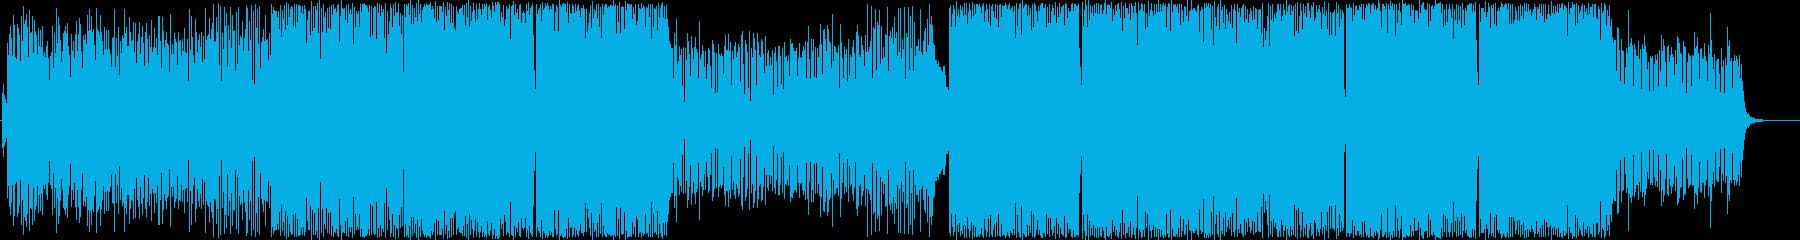 PVなど天体観測-希望-シンセエレクトロの再生済みの波形